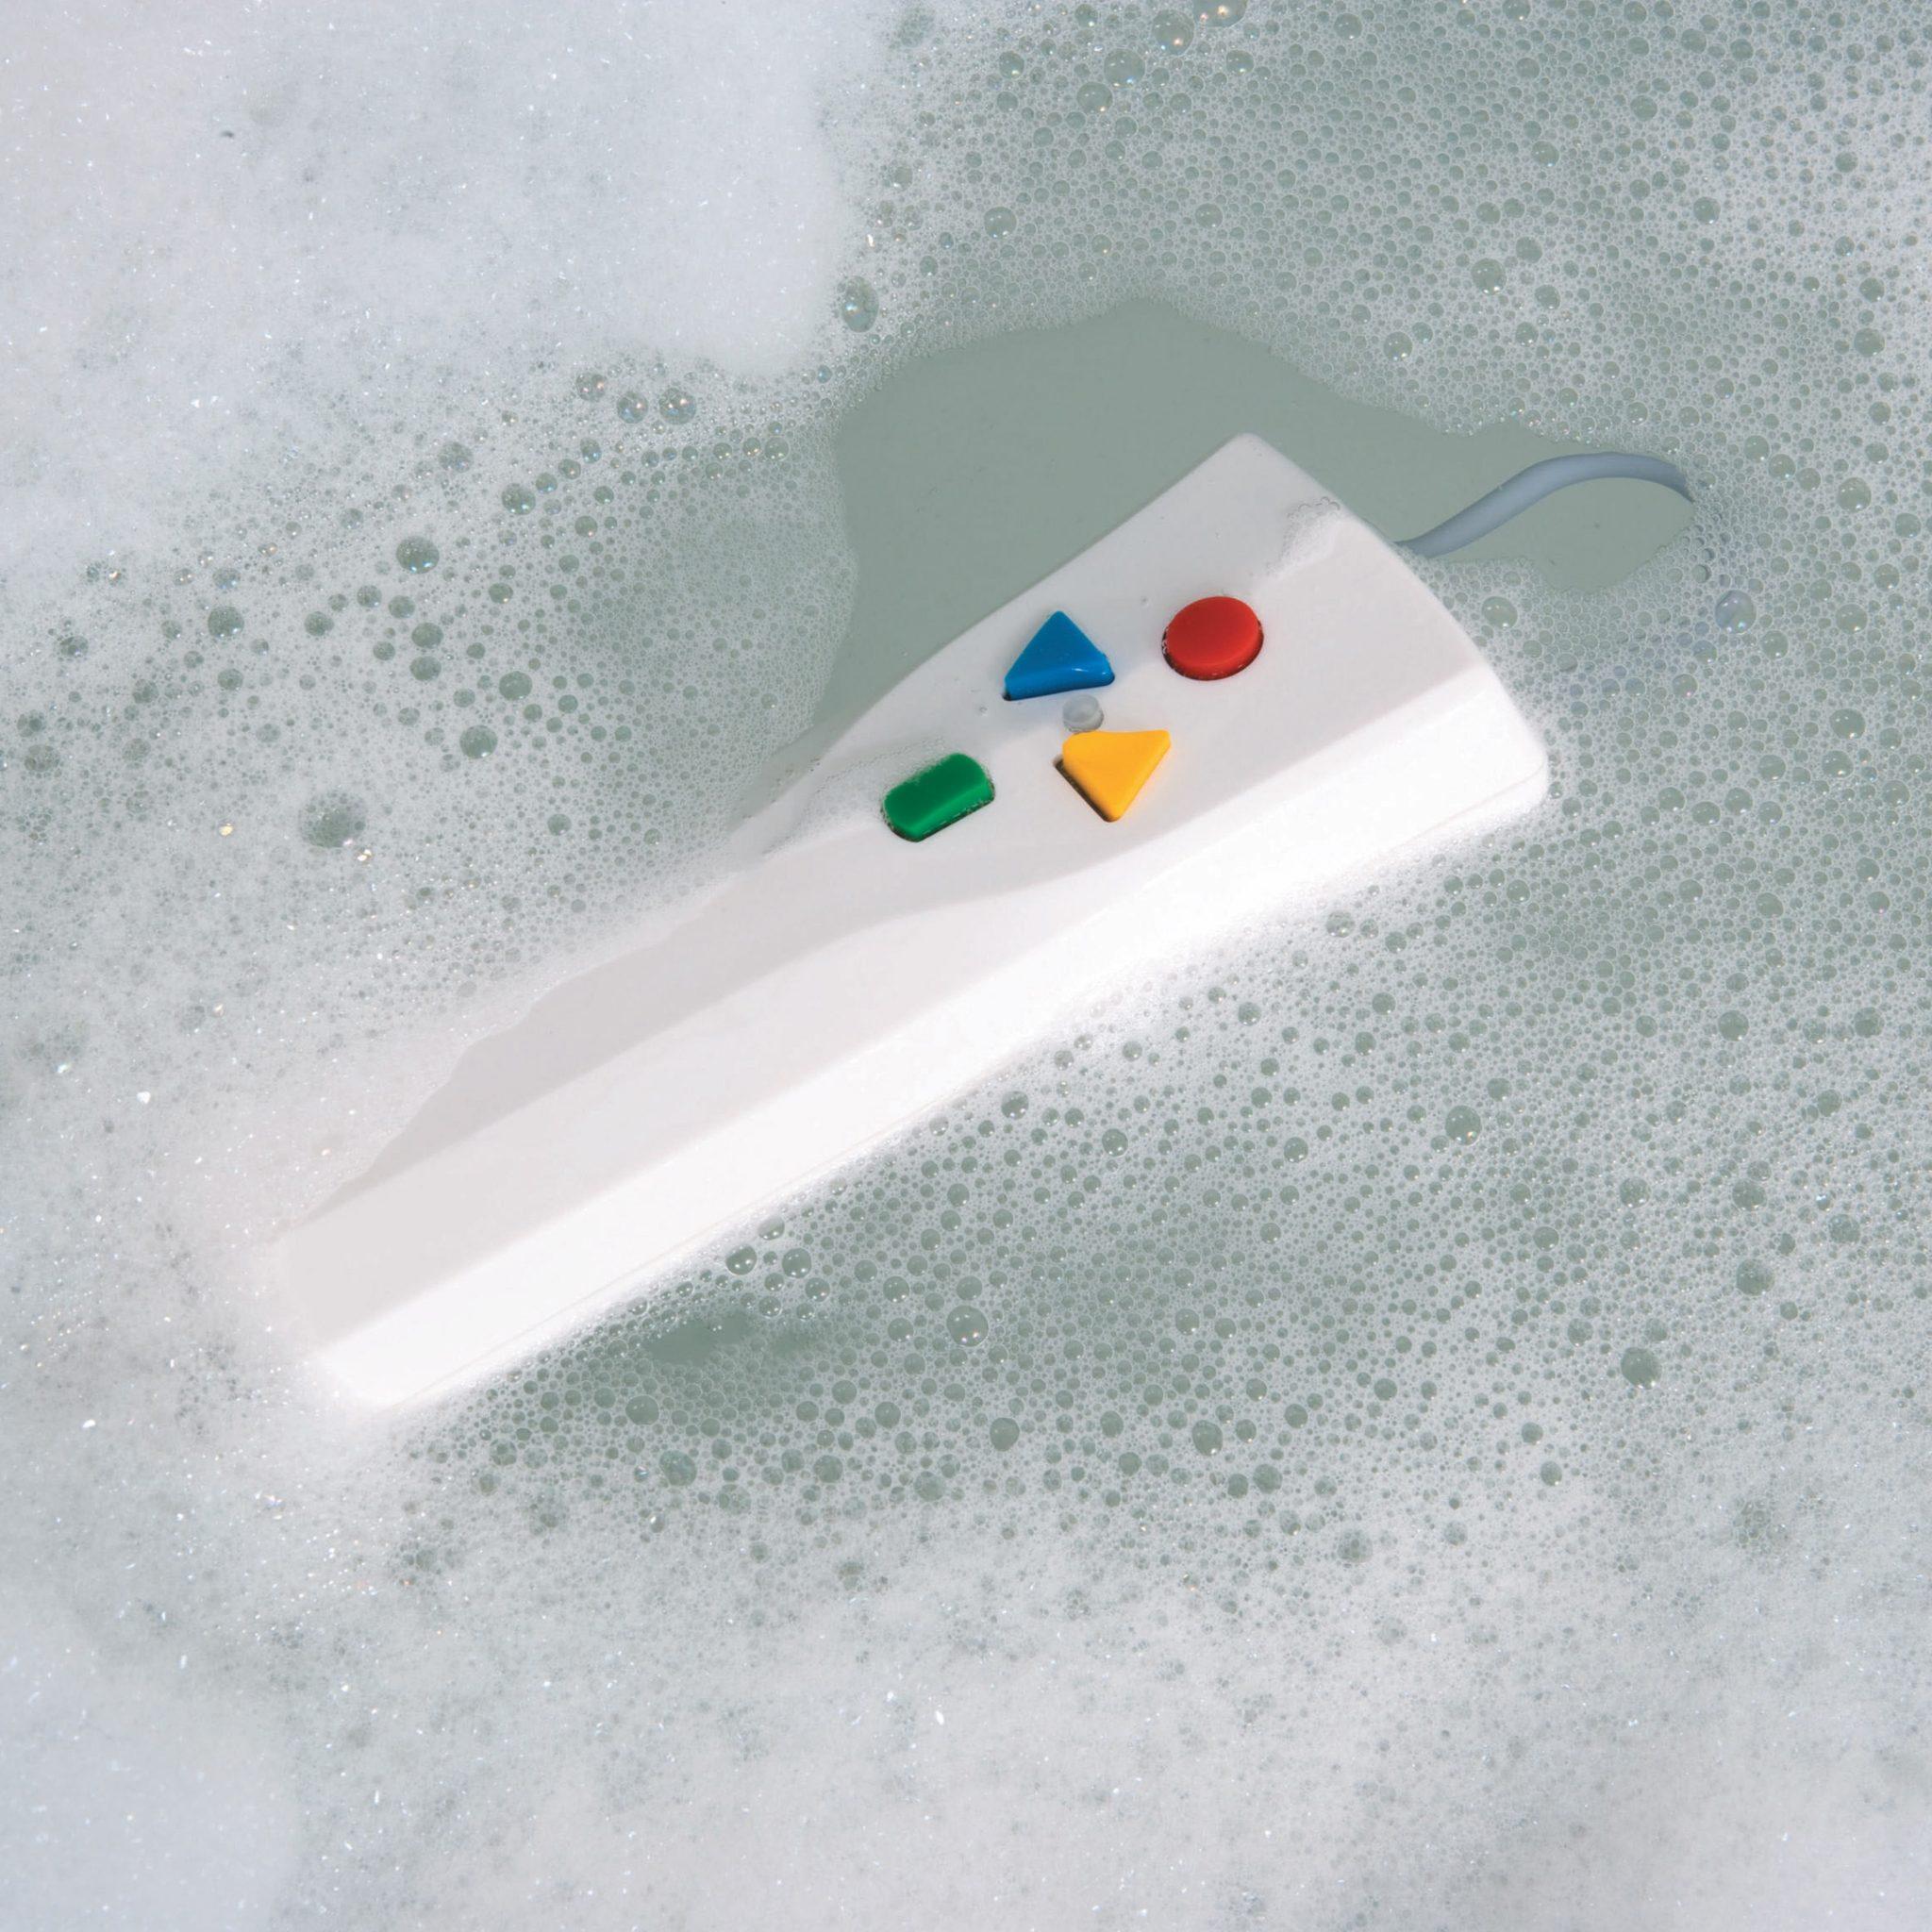 Bellavita Bath Lift Hand Controller - HomeAccessProducts.com